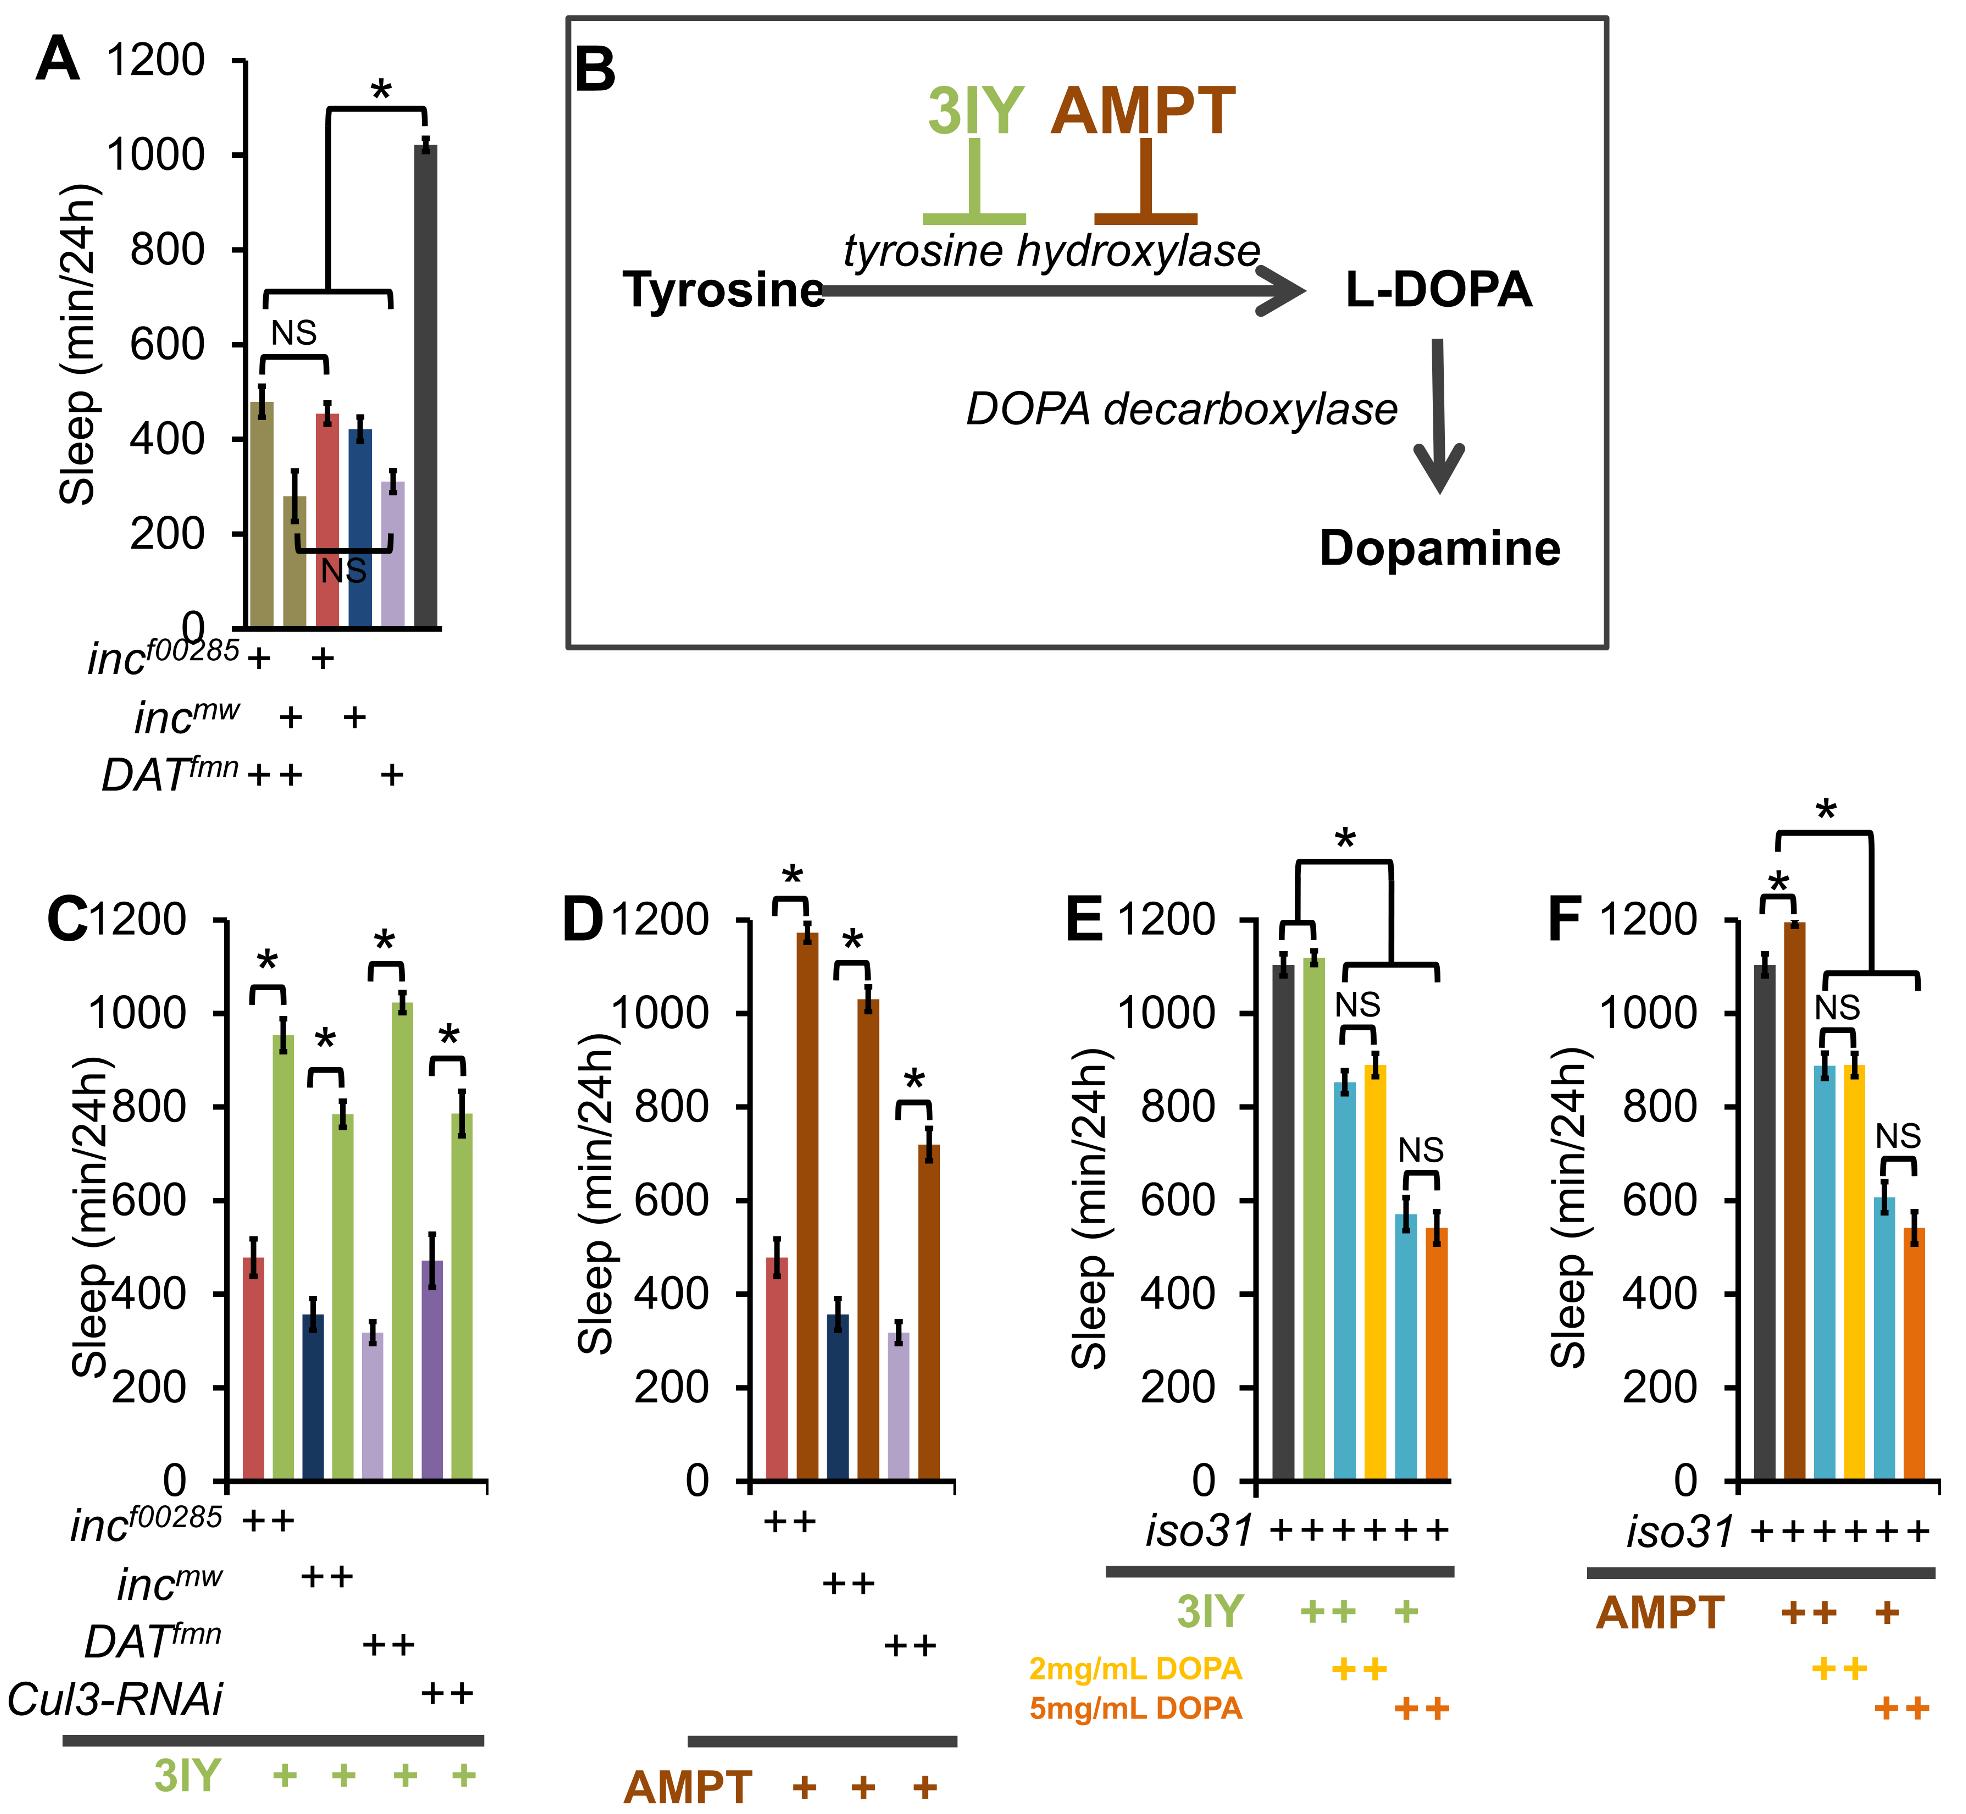 <i>inc</i> effects on sleep require a dopamine sleep-regulatory pathway.